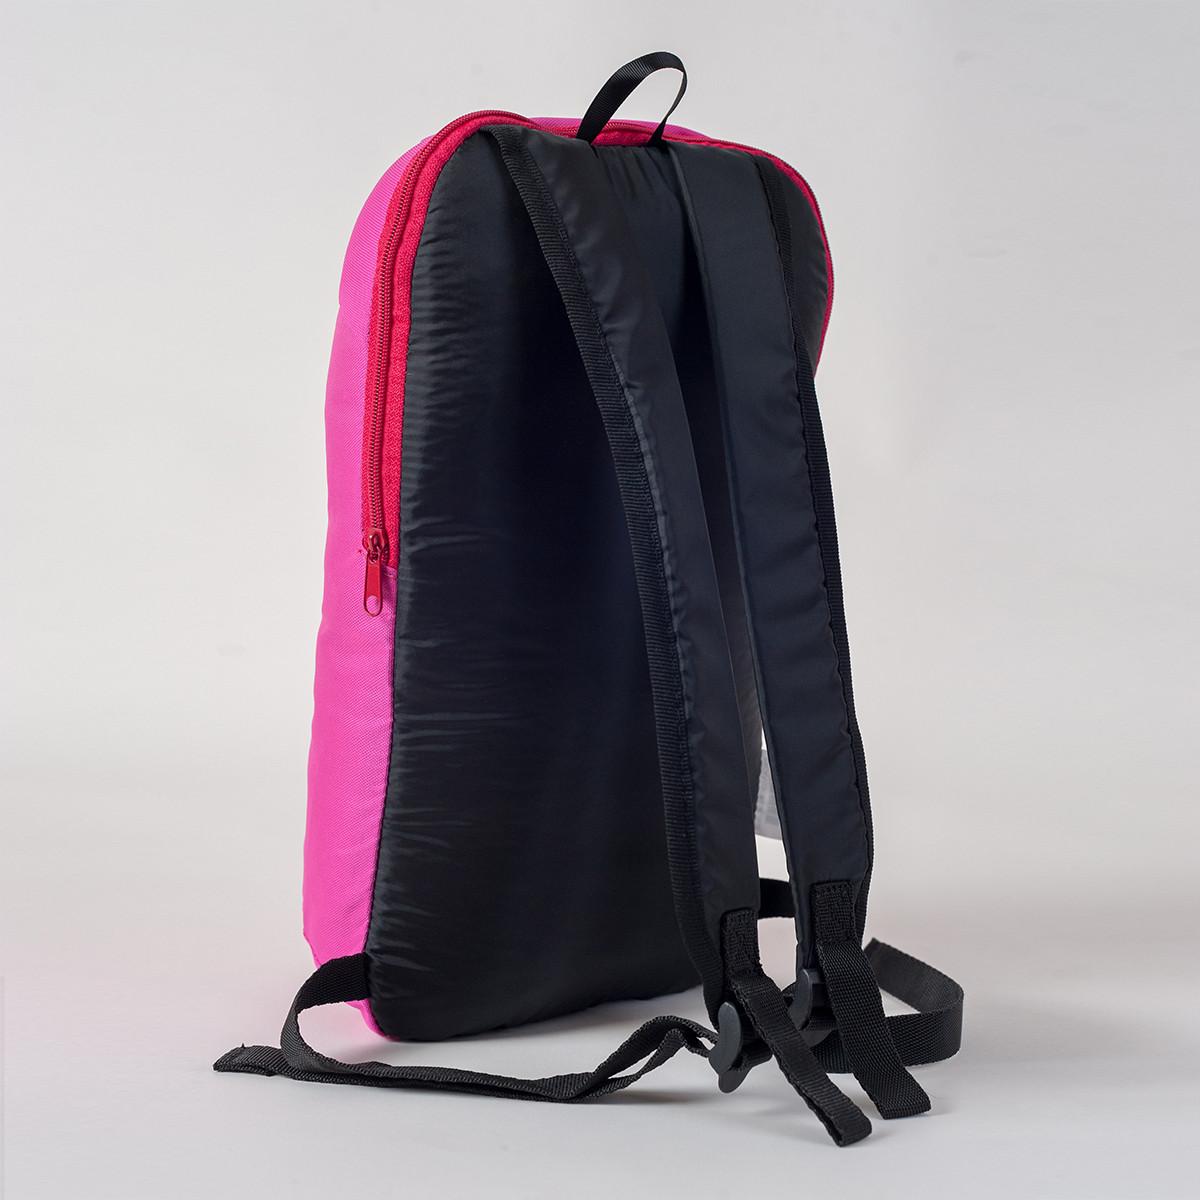 Спортивный рюкзак MAYERS 10L, розовый, фото 3